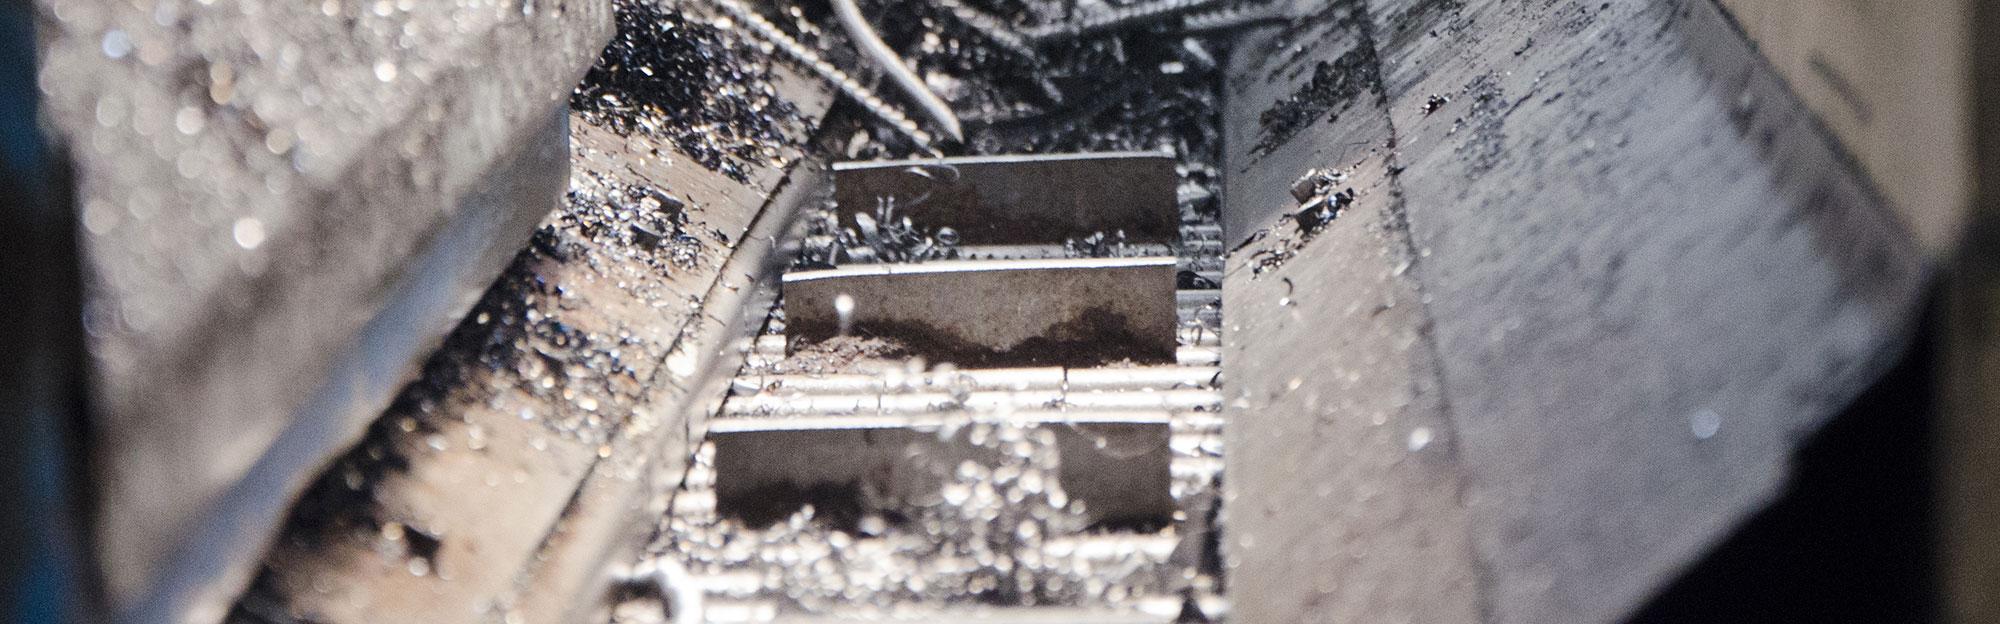 Shaving extractors for machine tools